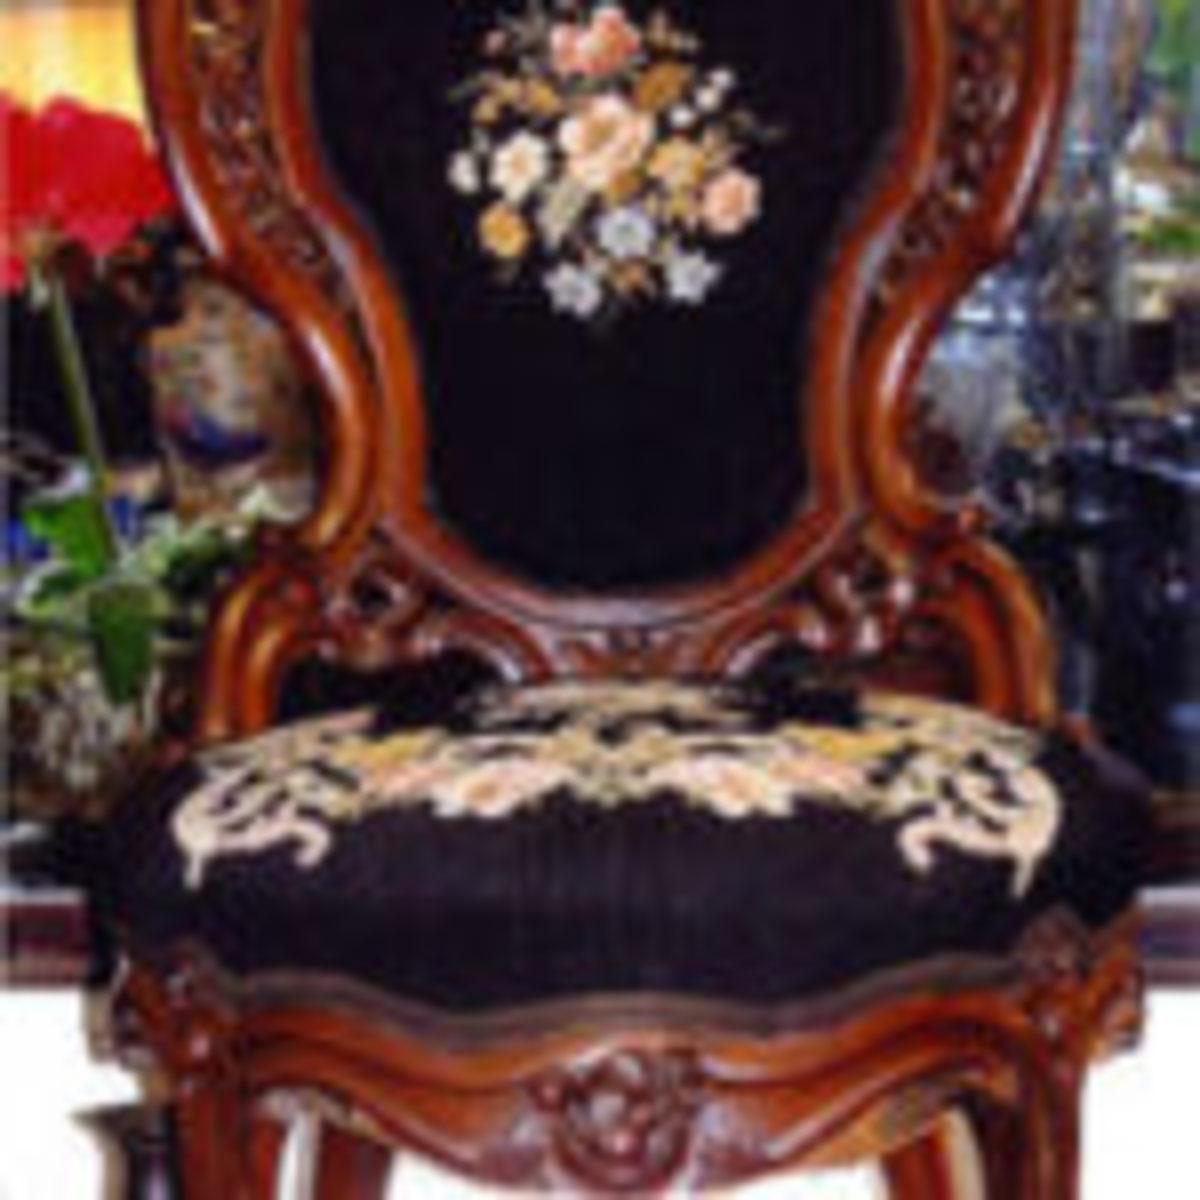 chair by J. & J.W. Meeks